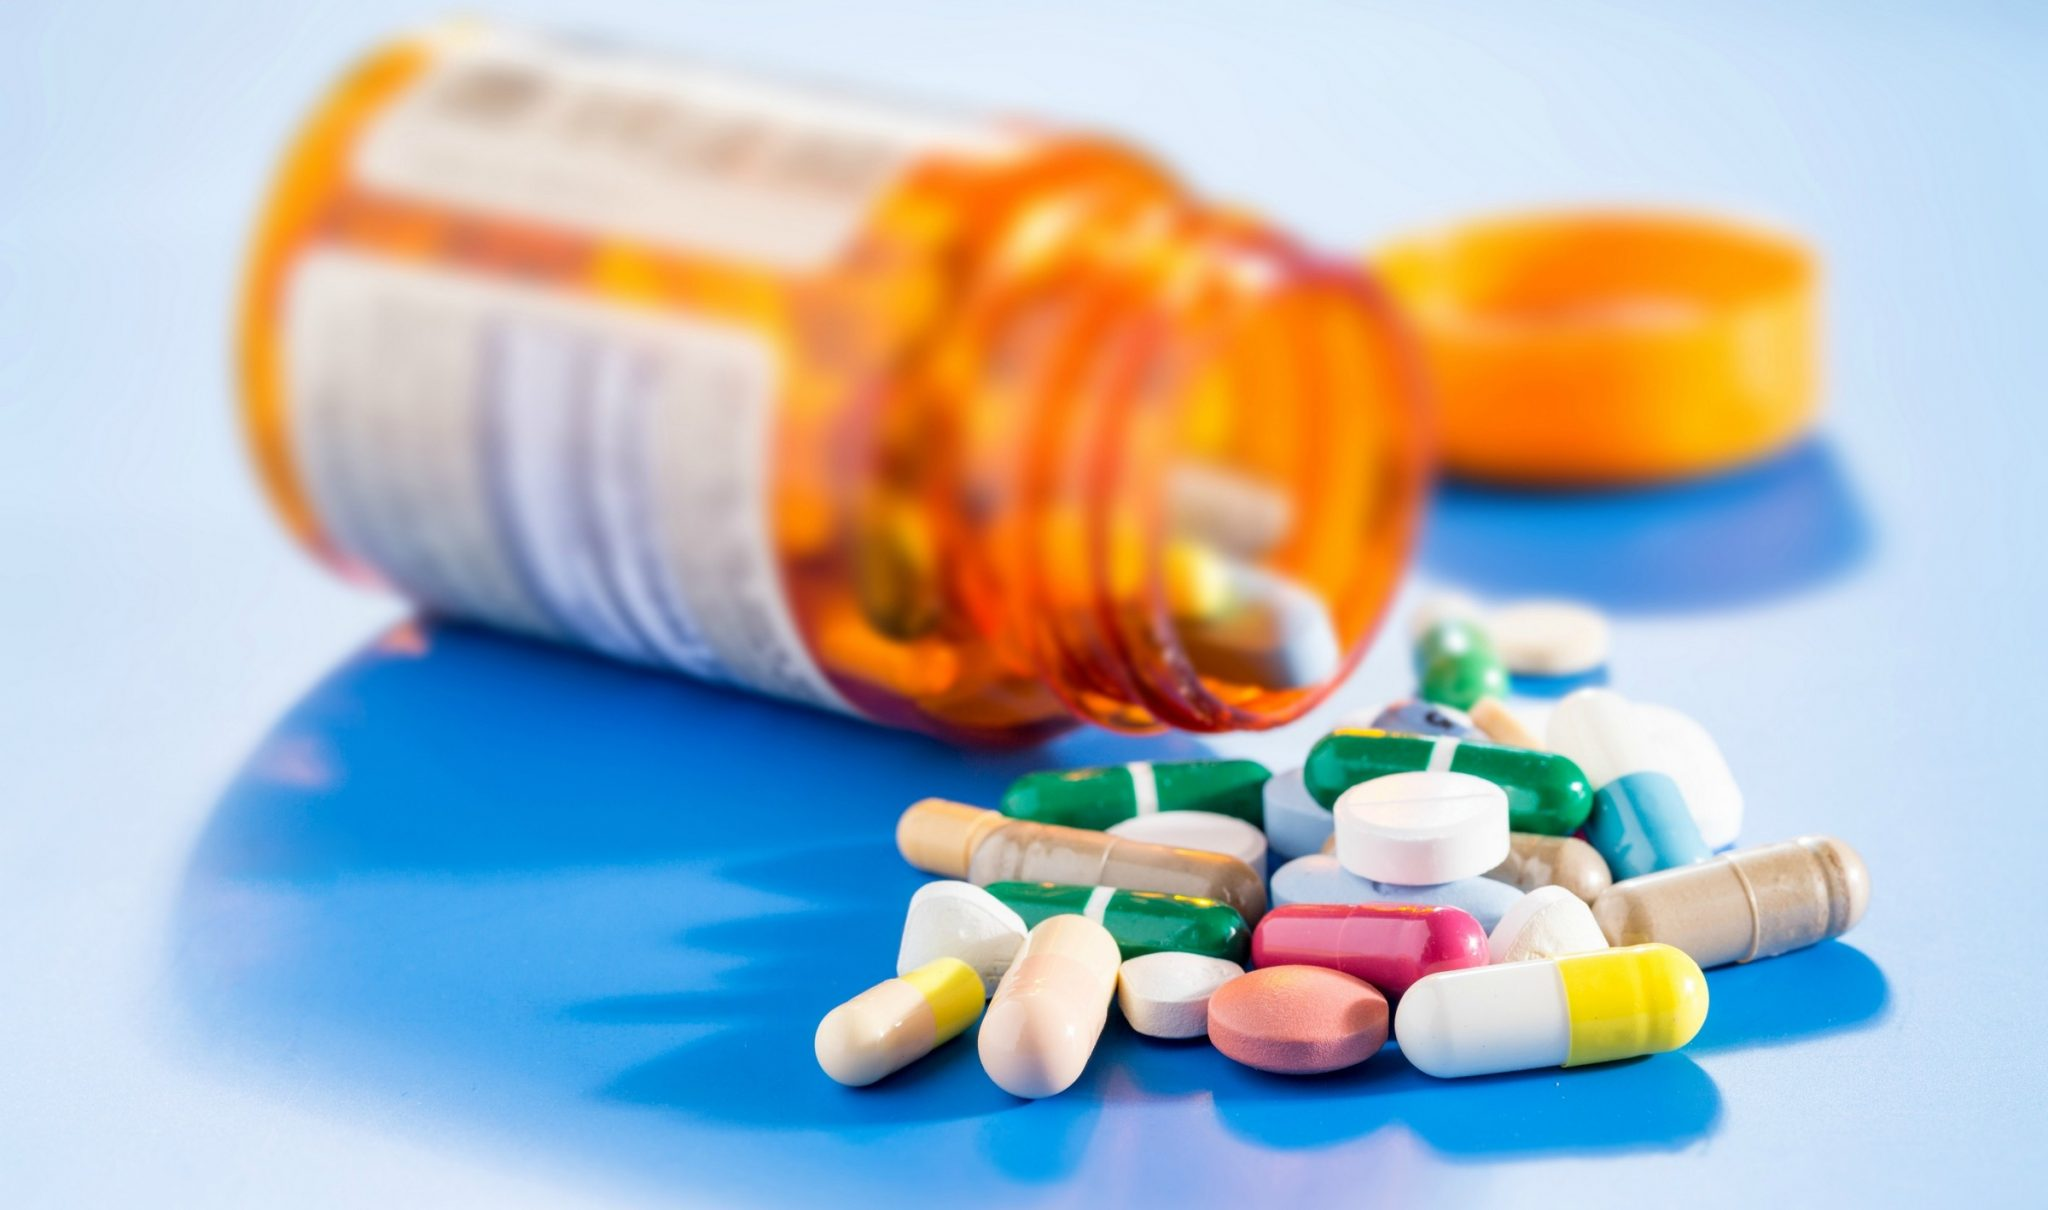 Anvisa autoriza medicamento experimental contra Covid-19